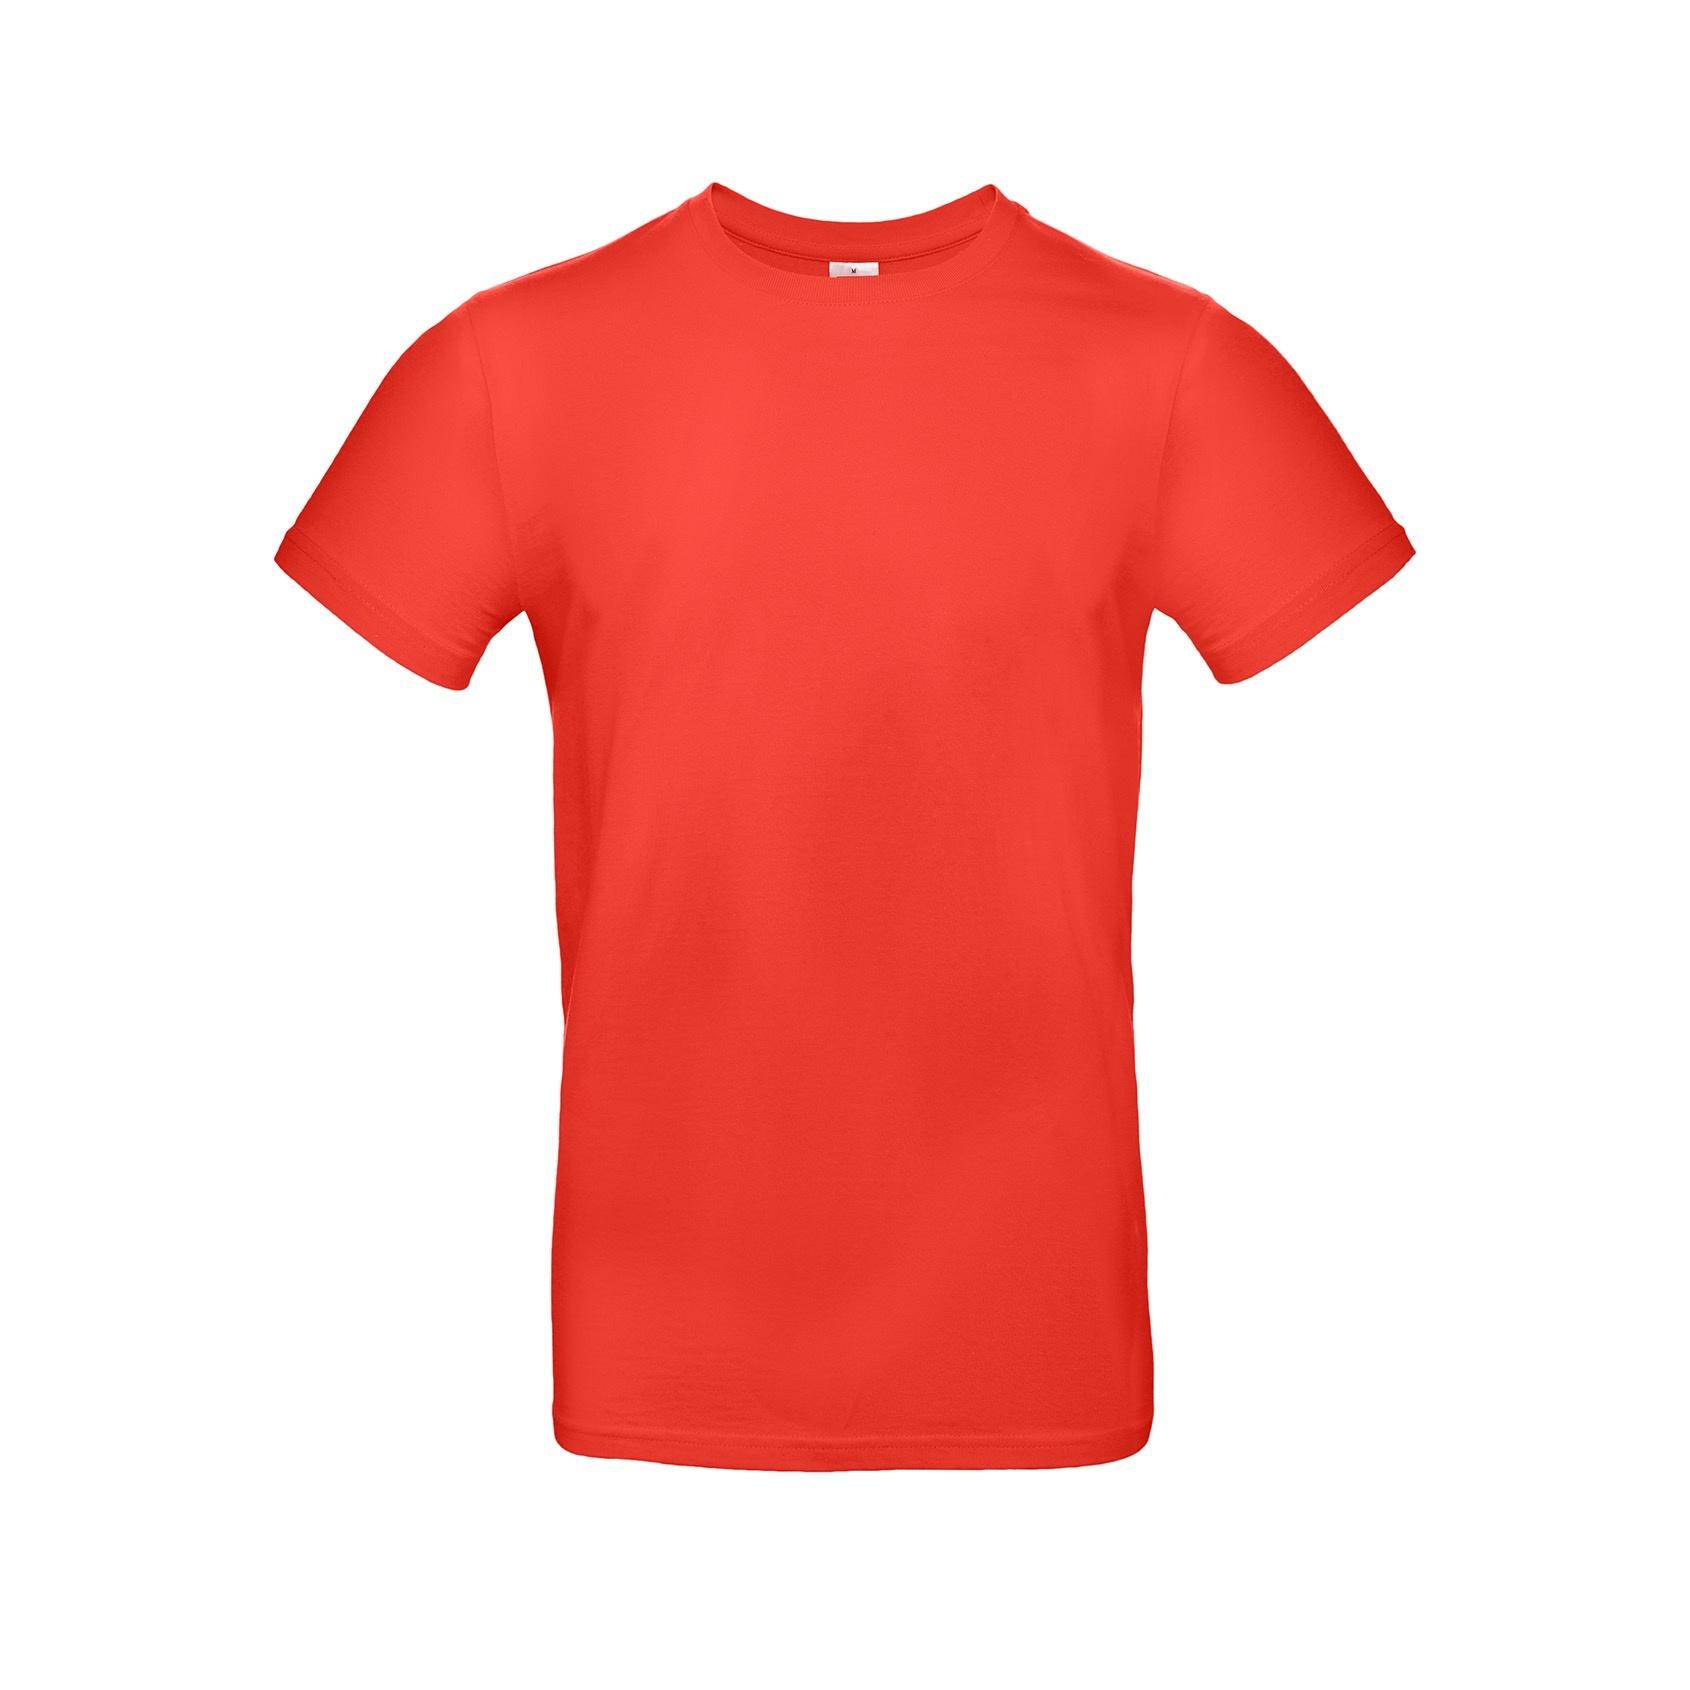 B/&c homme à manches courtes T-shirt E190 Tee